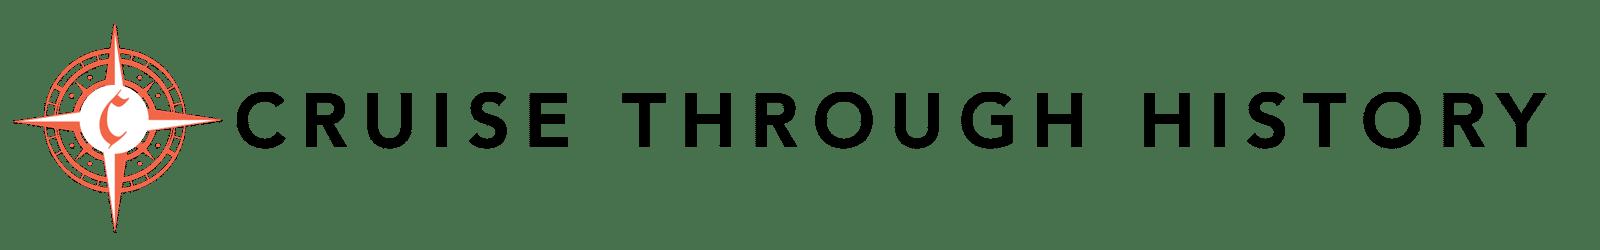 Cruise Through History Logo